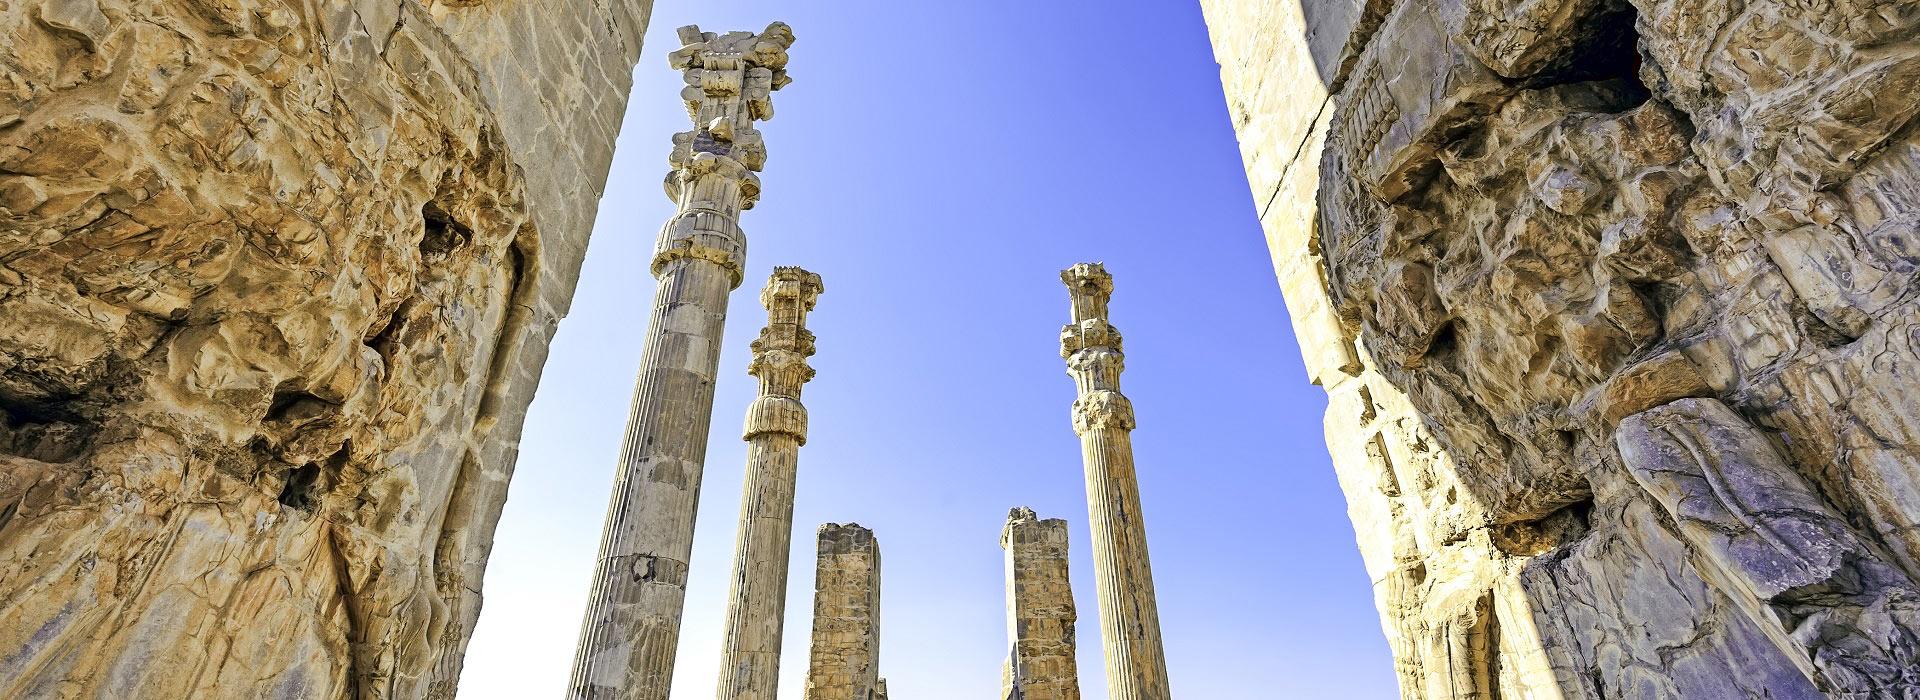 gates_of_xerxes_palace_in_persepolis